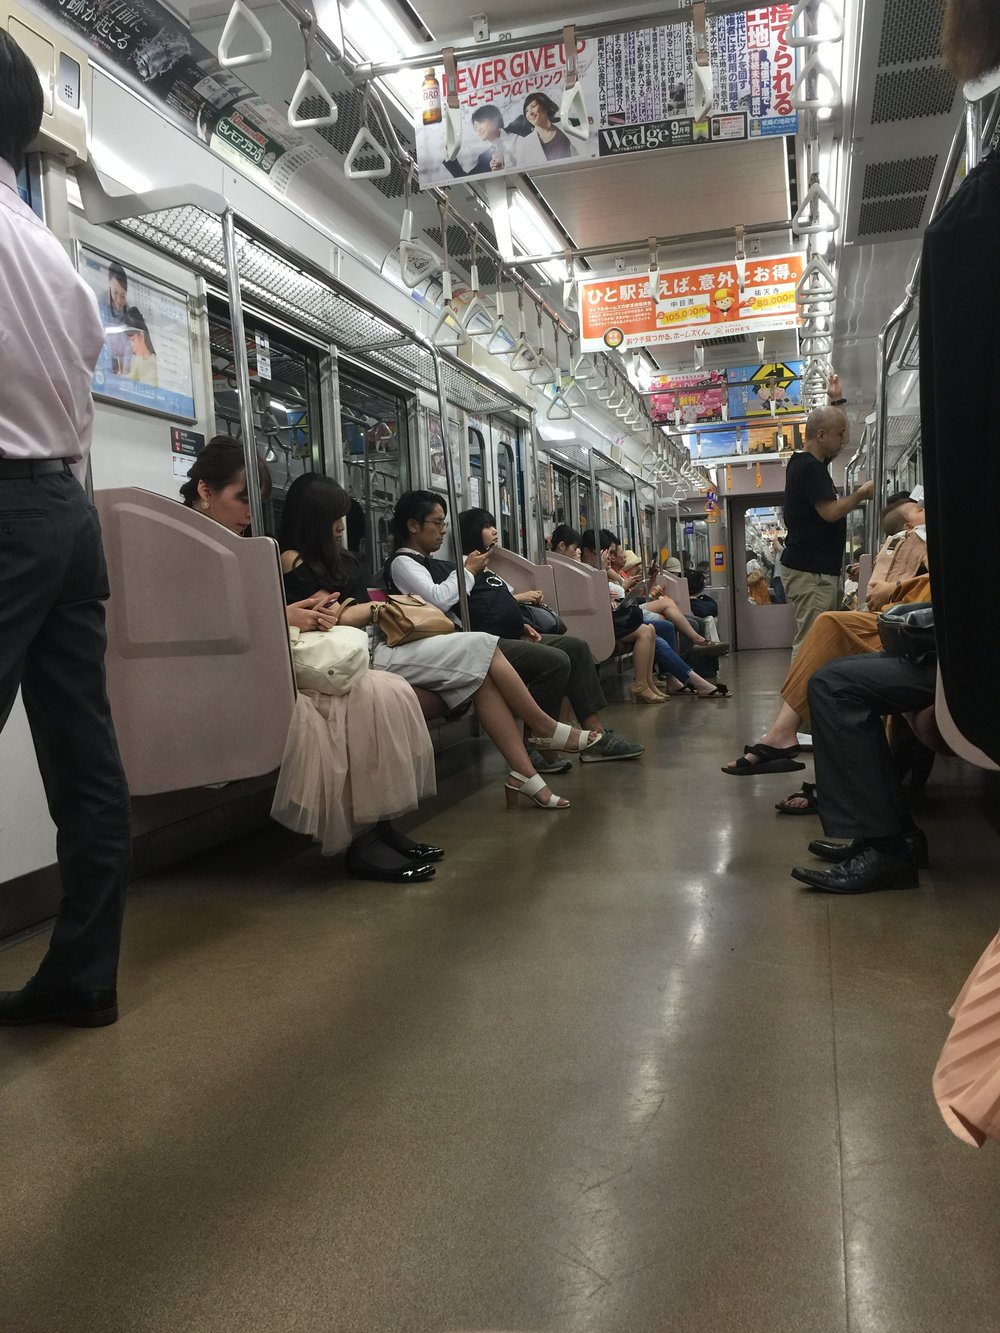 Photo 26-08-2017, 11 52 13.jpg